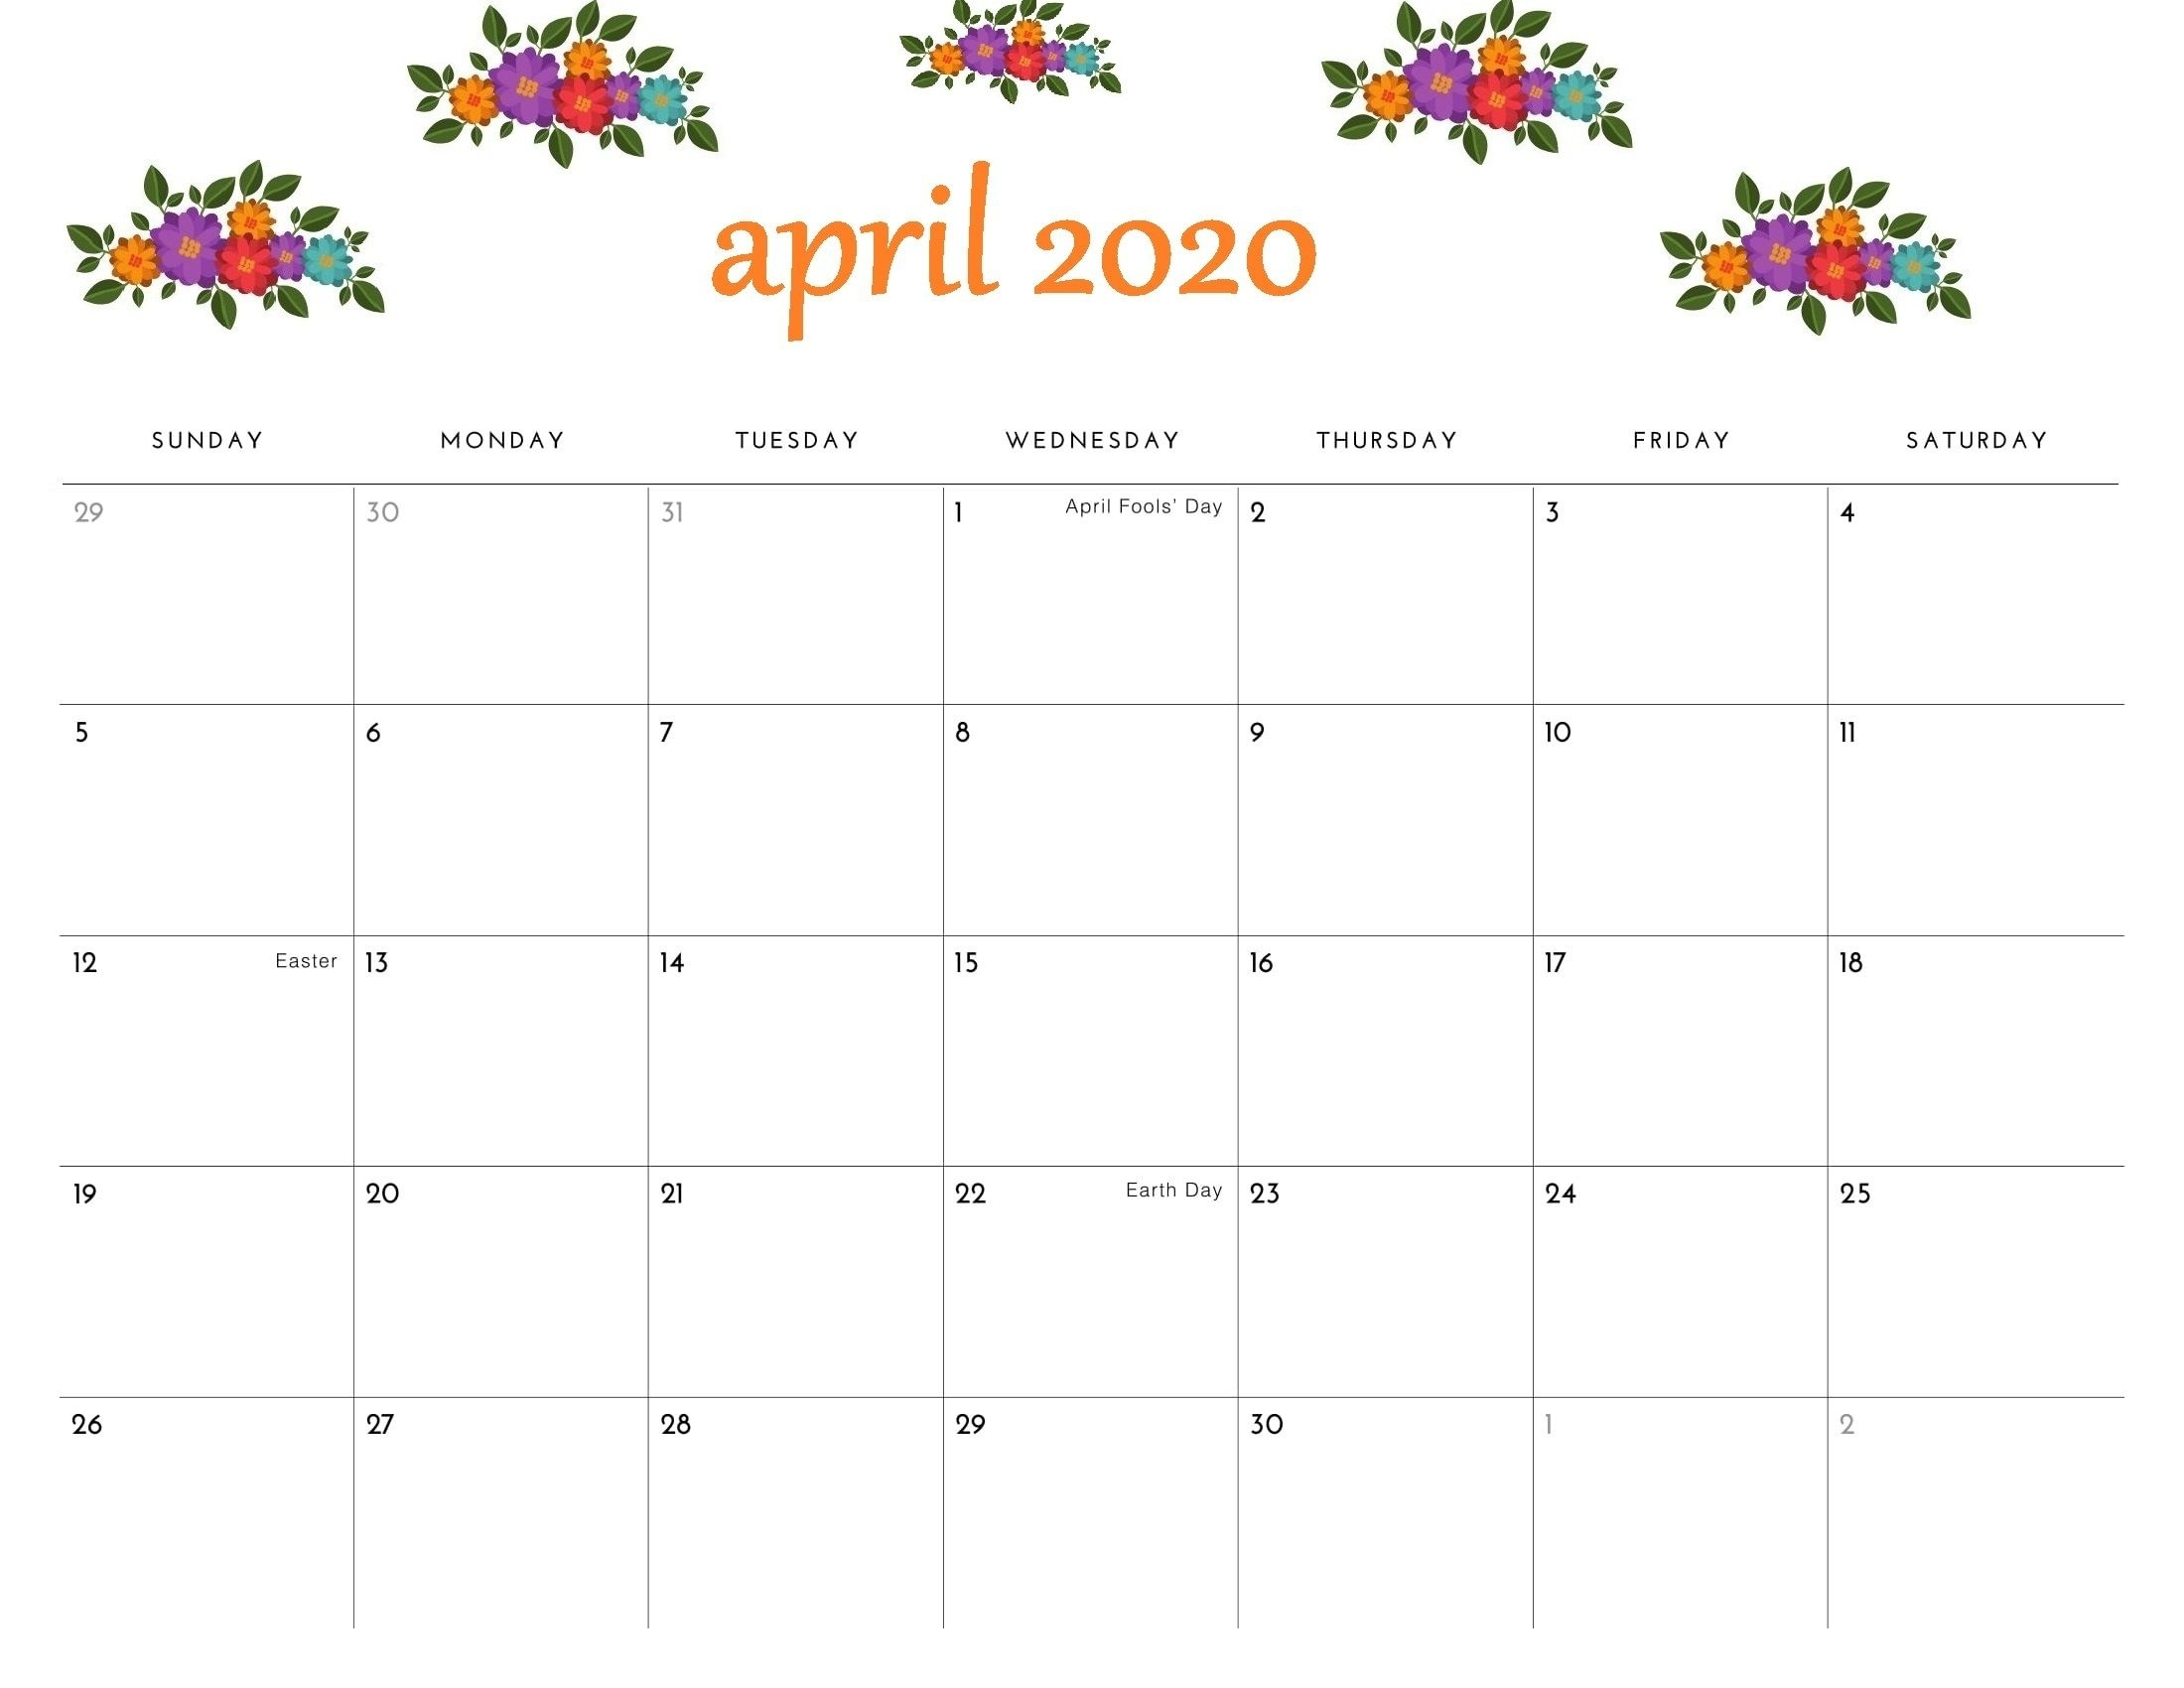 Floral April 2020 Calendar Cute - Desk And Wall Wallpaper In